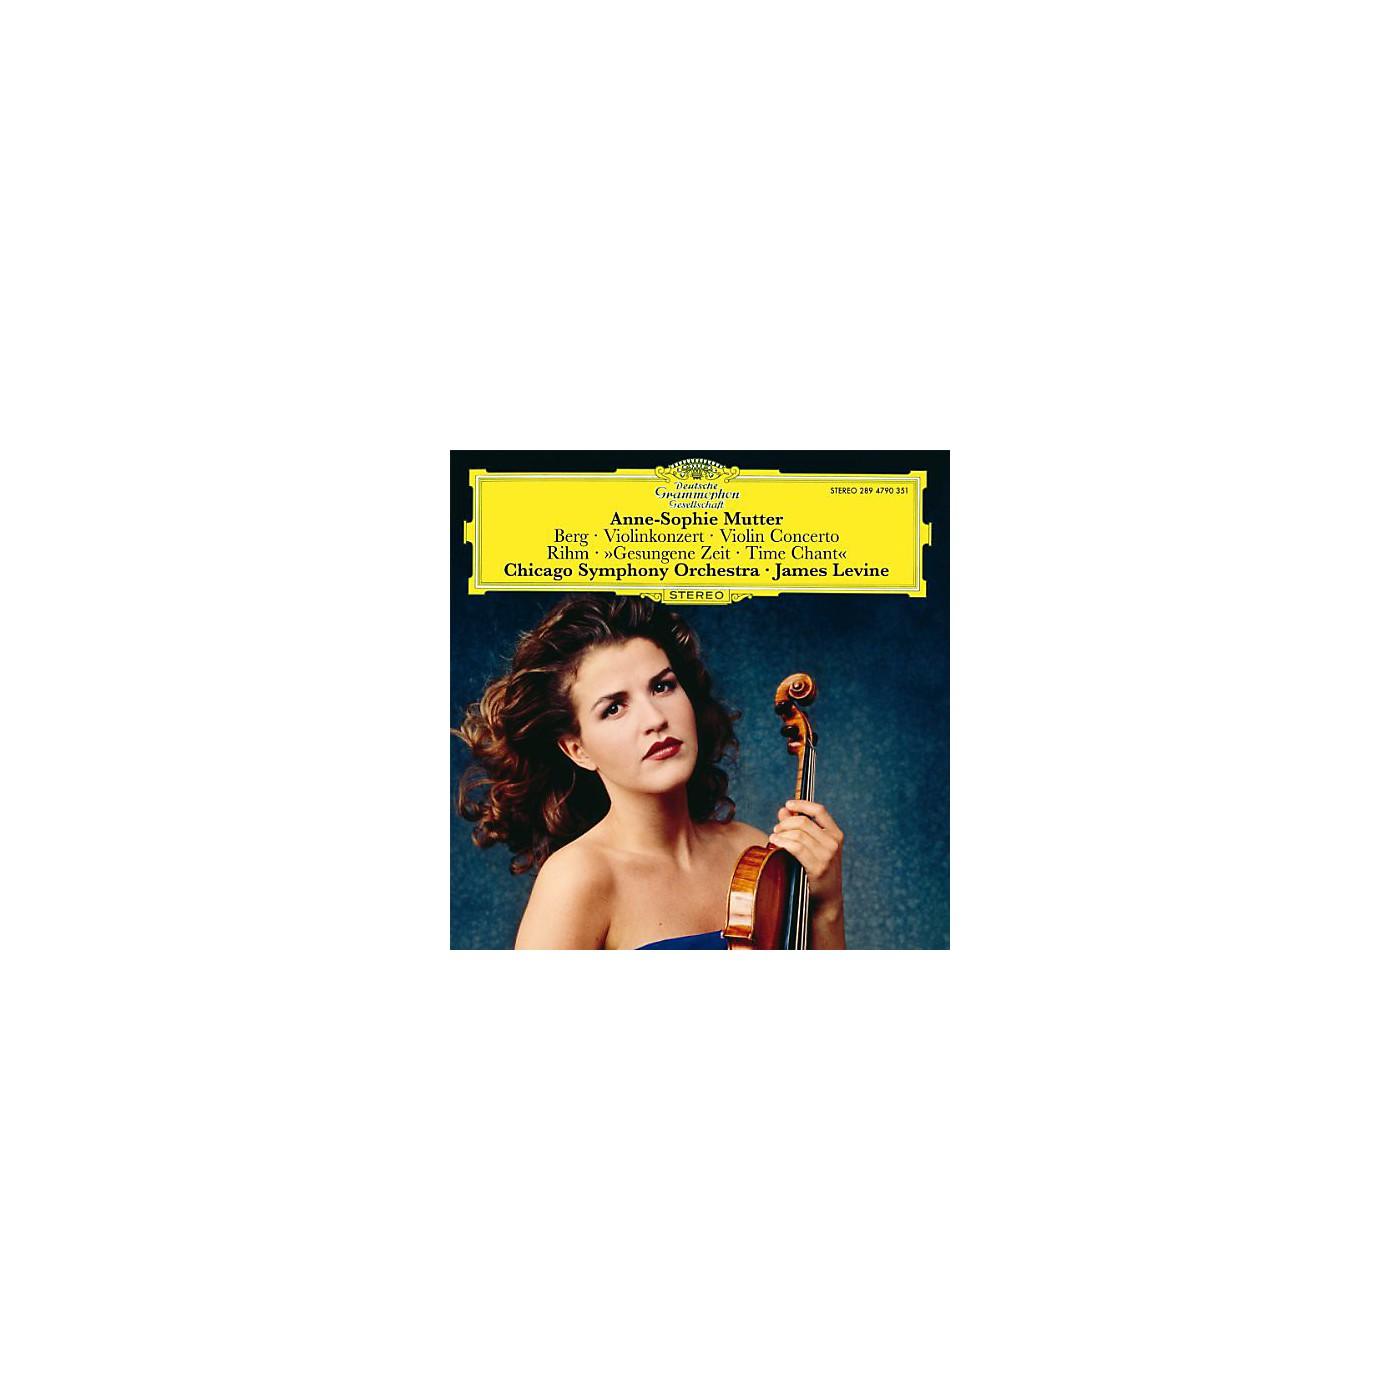 Alliance Anne-Sophie Mutter - Violin Concert/Gesungene thumbnail